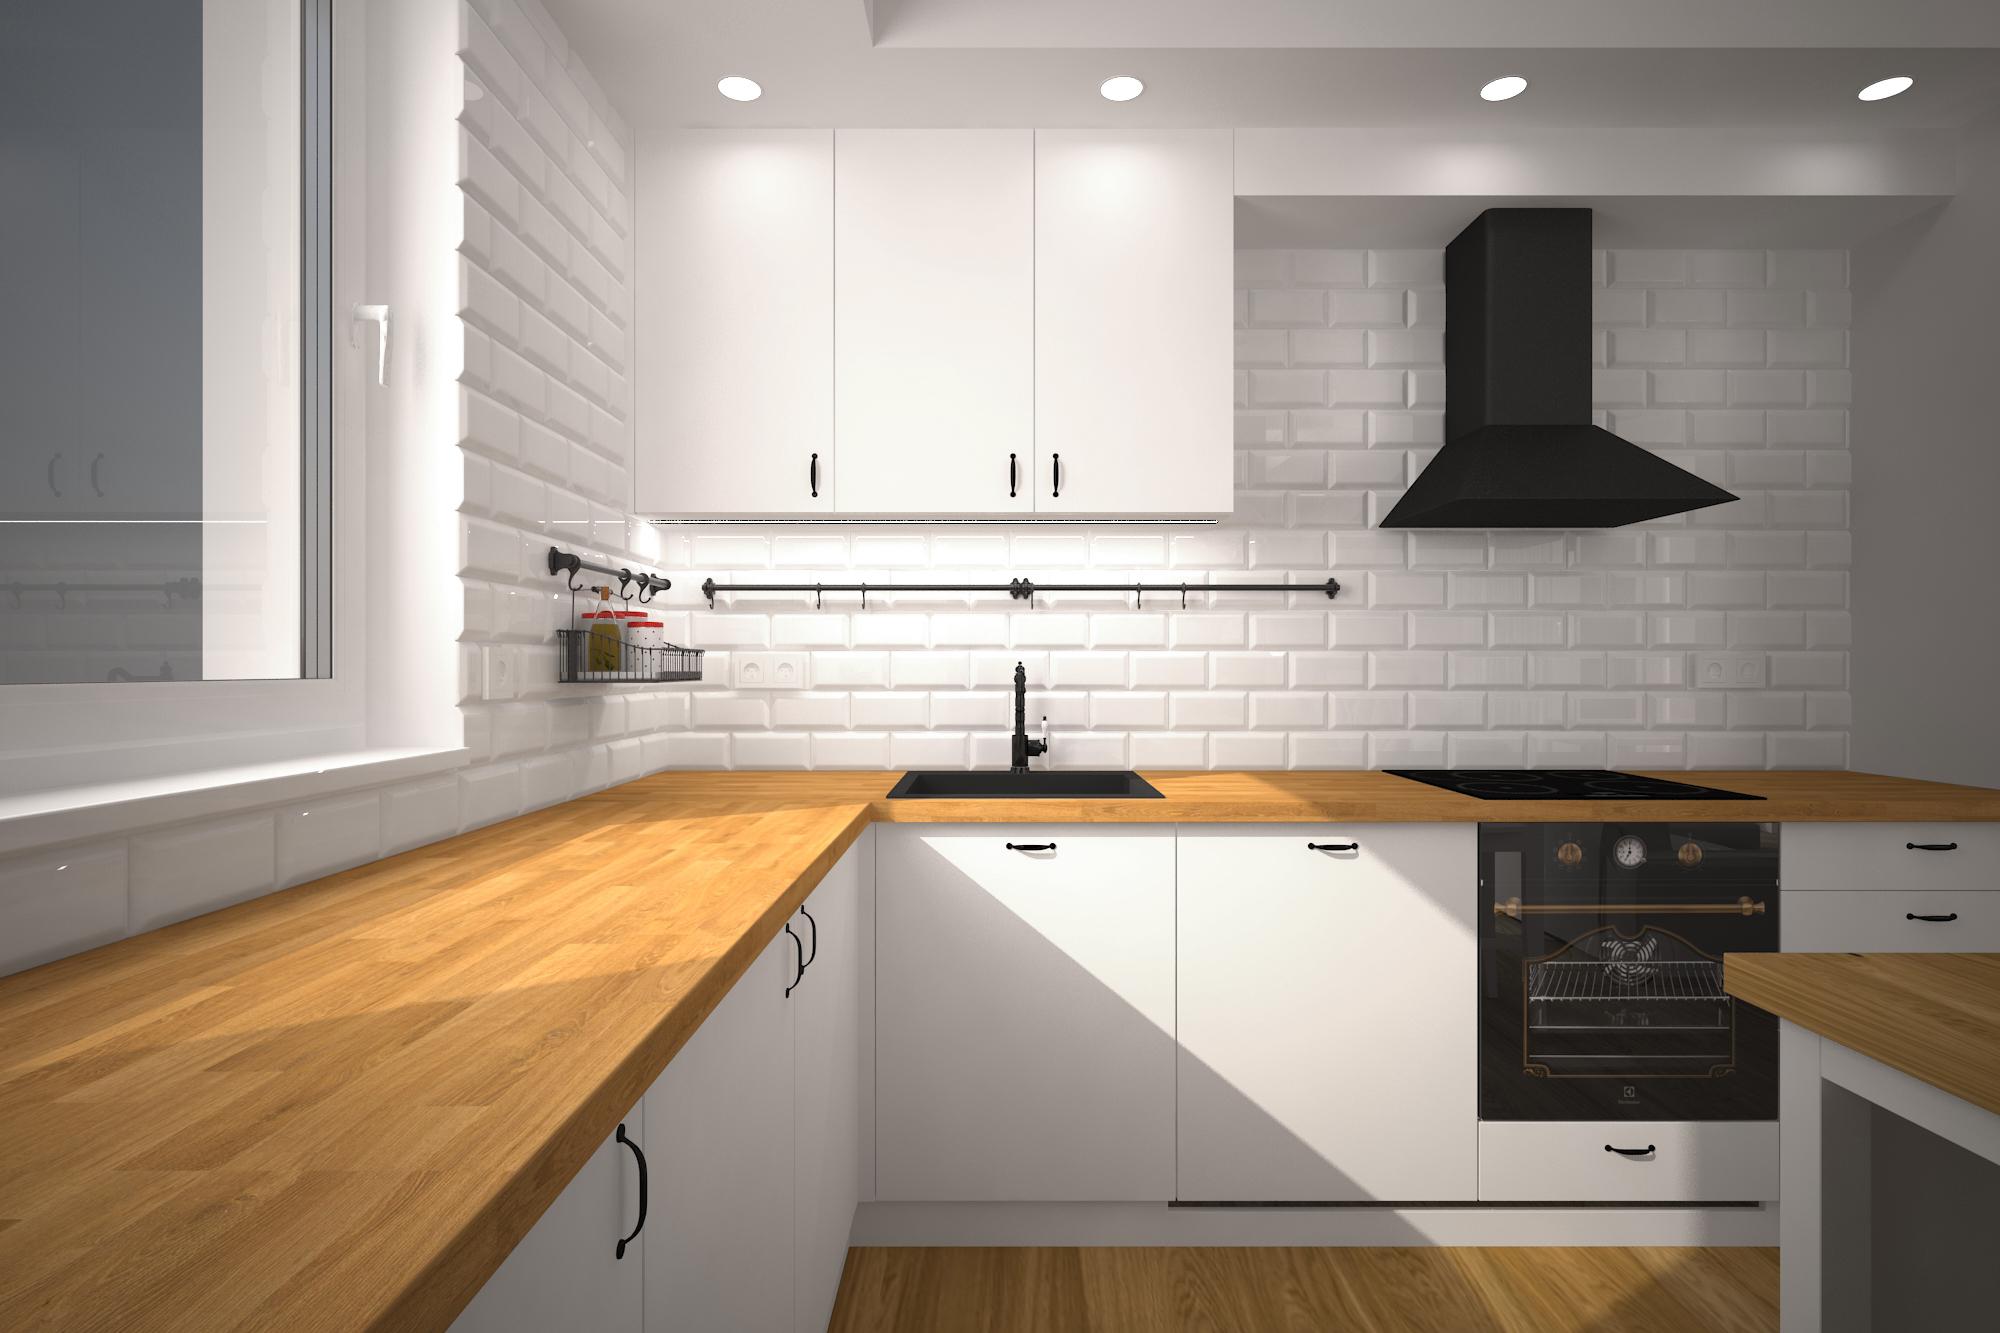 https://ddprojekt.pl/wp-content/uploads/2020/03/kuchnia_widok_1_wizualizacja-2.jpg